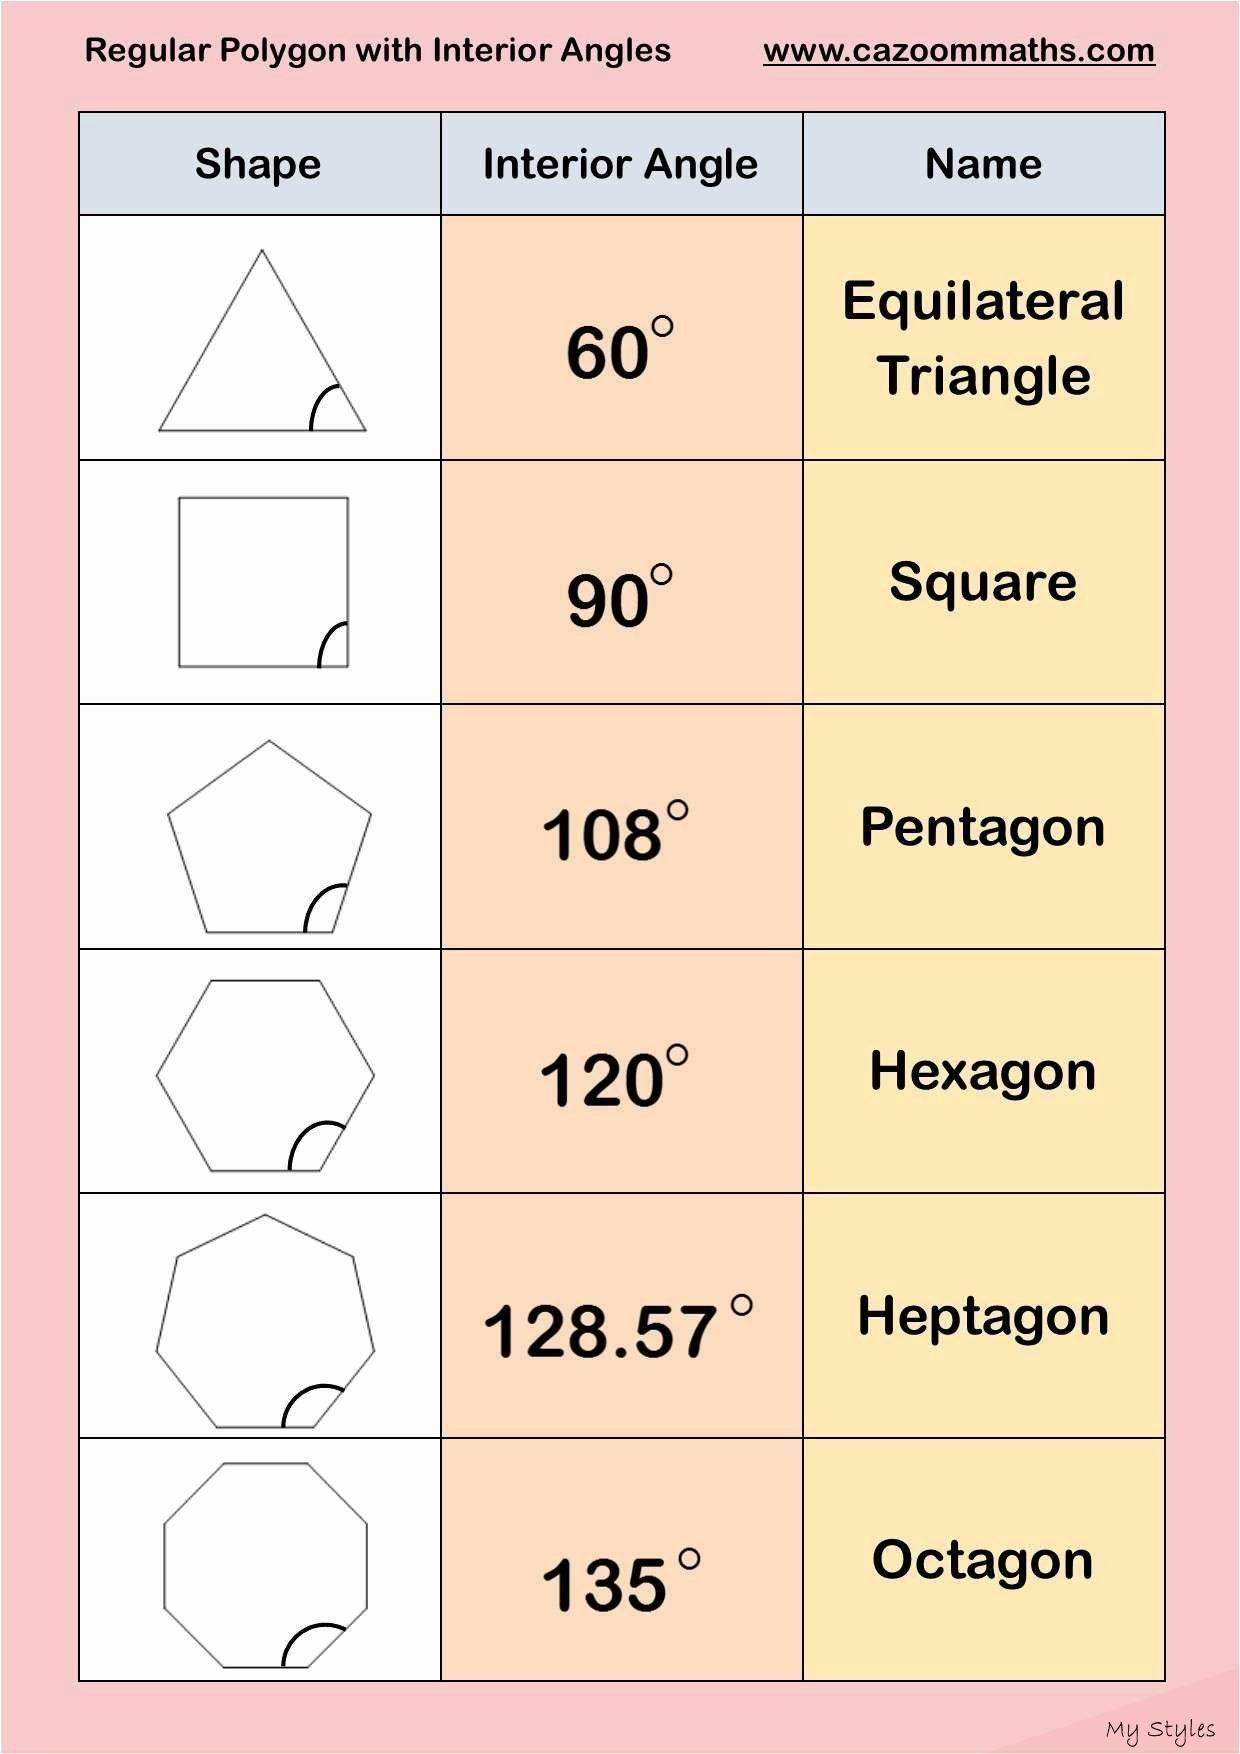 Jan 10 2020 Exterior Angle Theorem Worksheet 50 Exterior Angle Theorem Worksheet Triangle Inequality Wor In 2020 Math Worksheet Regular Polygon Angles Worksheet